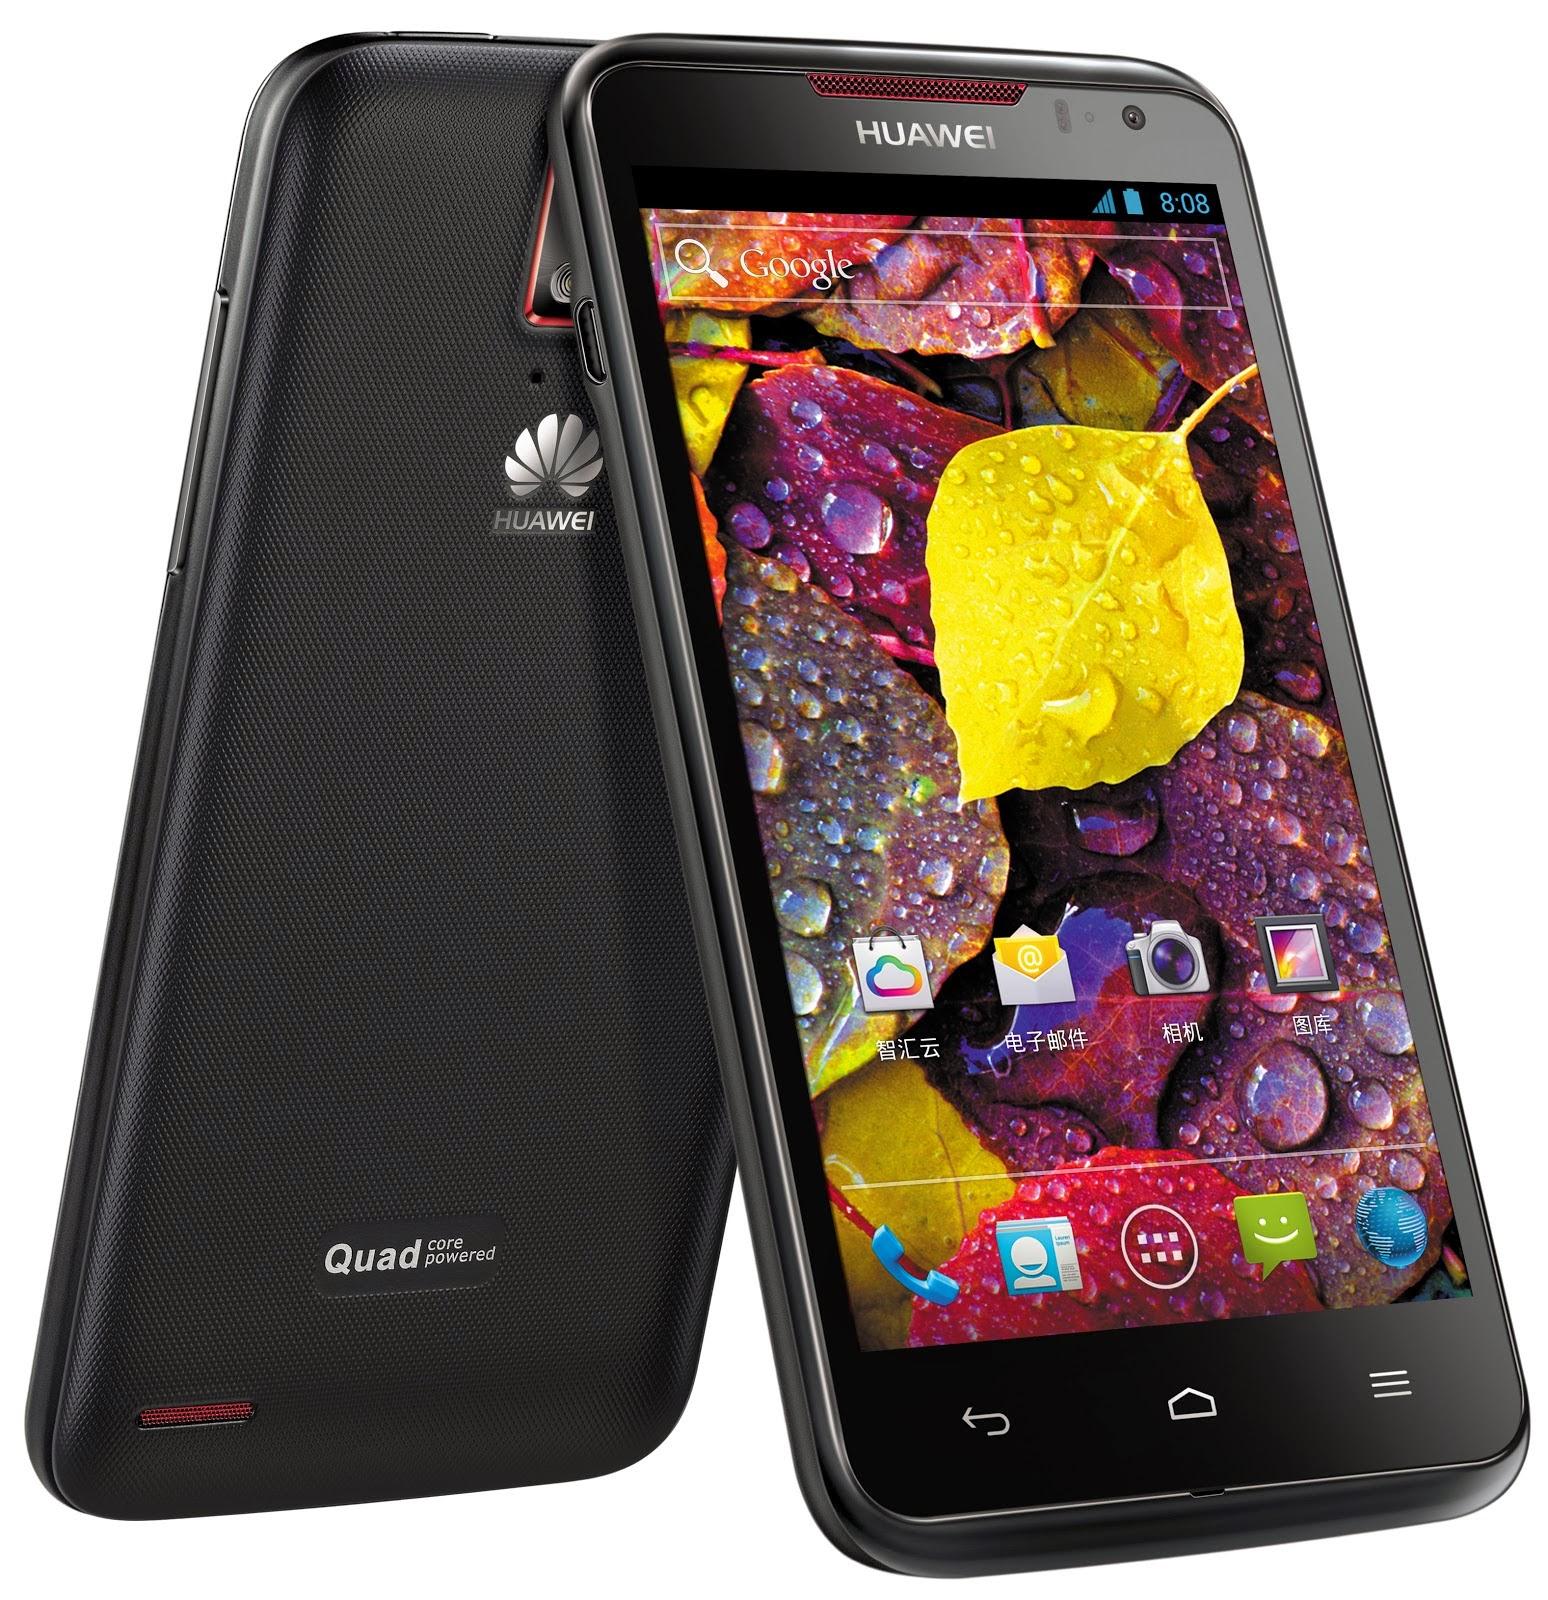 mwc 2014 ucuz telefonlar popüler